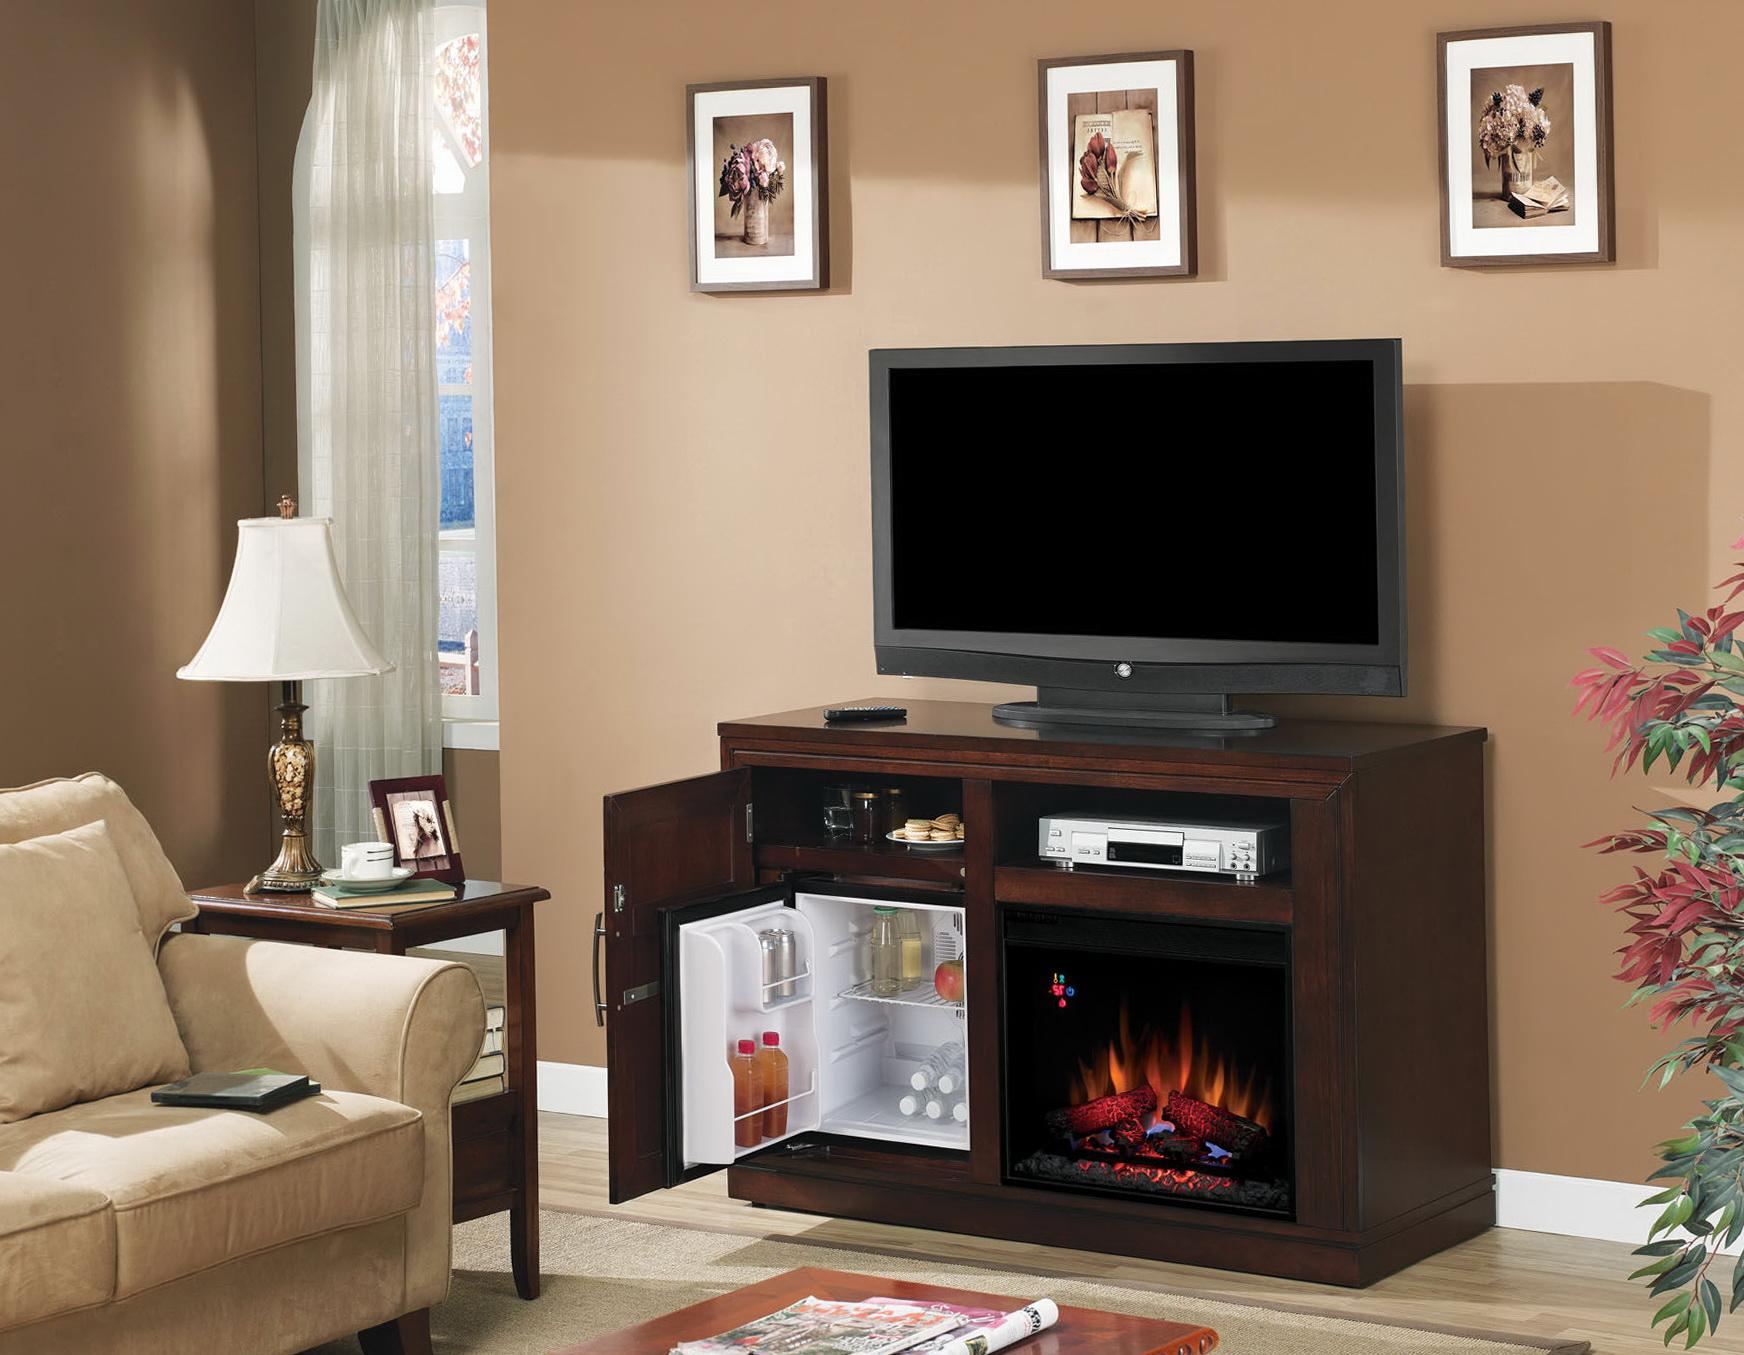 Electric Fireplace With Mini Fridge | Home Design Ideas